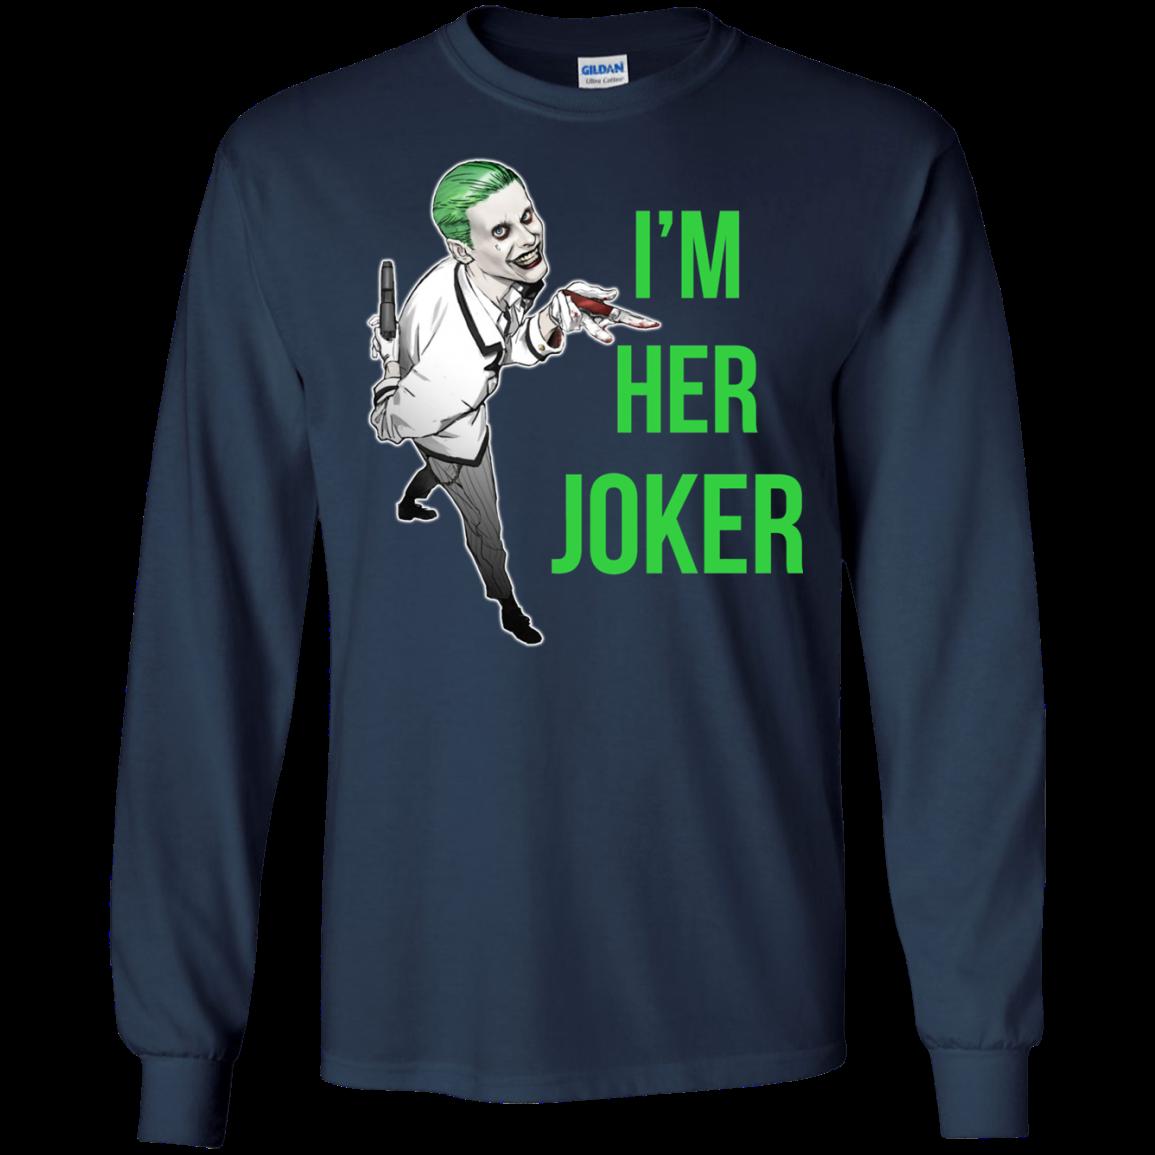 1fe83e2a Her Joker - His Harley Quinn t shirt, long sleeve, hoodie ...